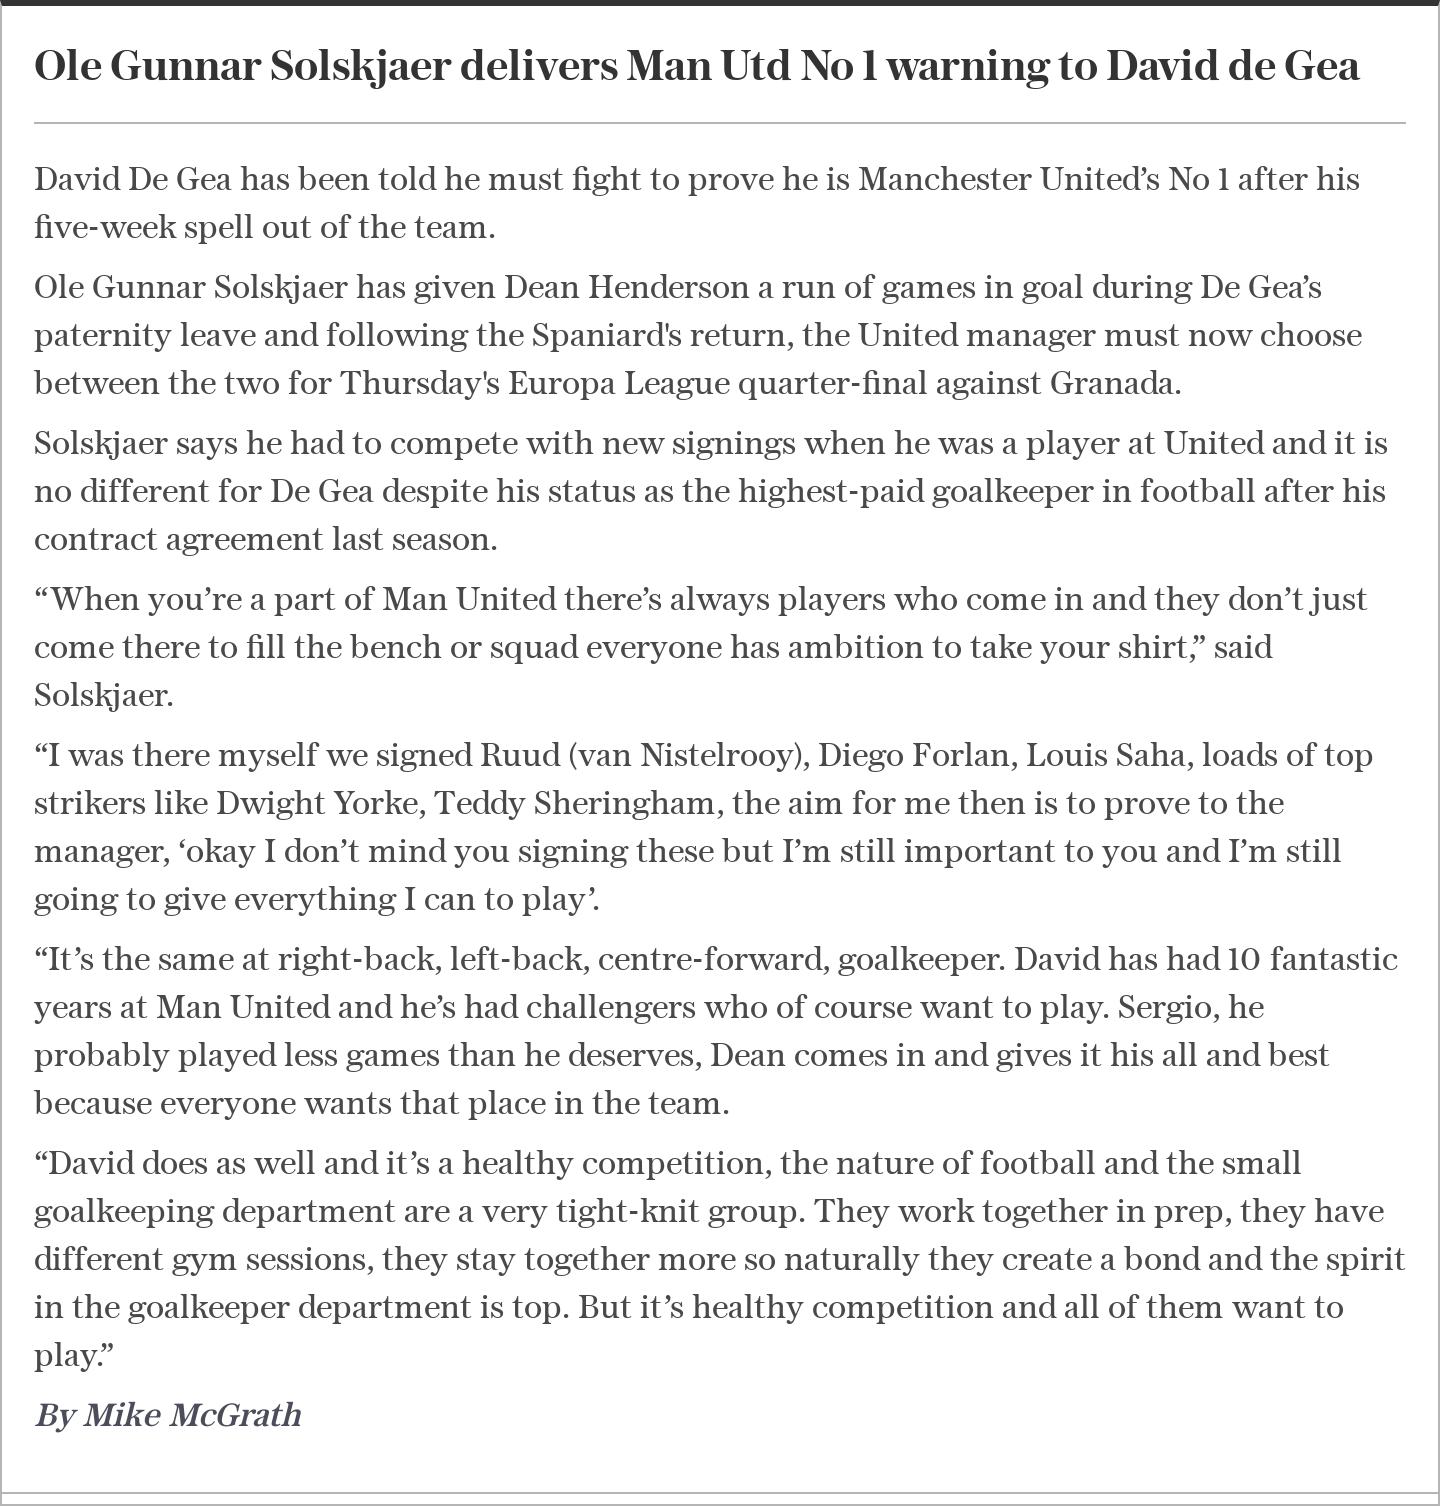 Ole Gunnar Solskjaer delivers Man Utd No 1 warning to David de Gea